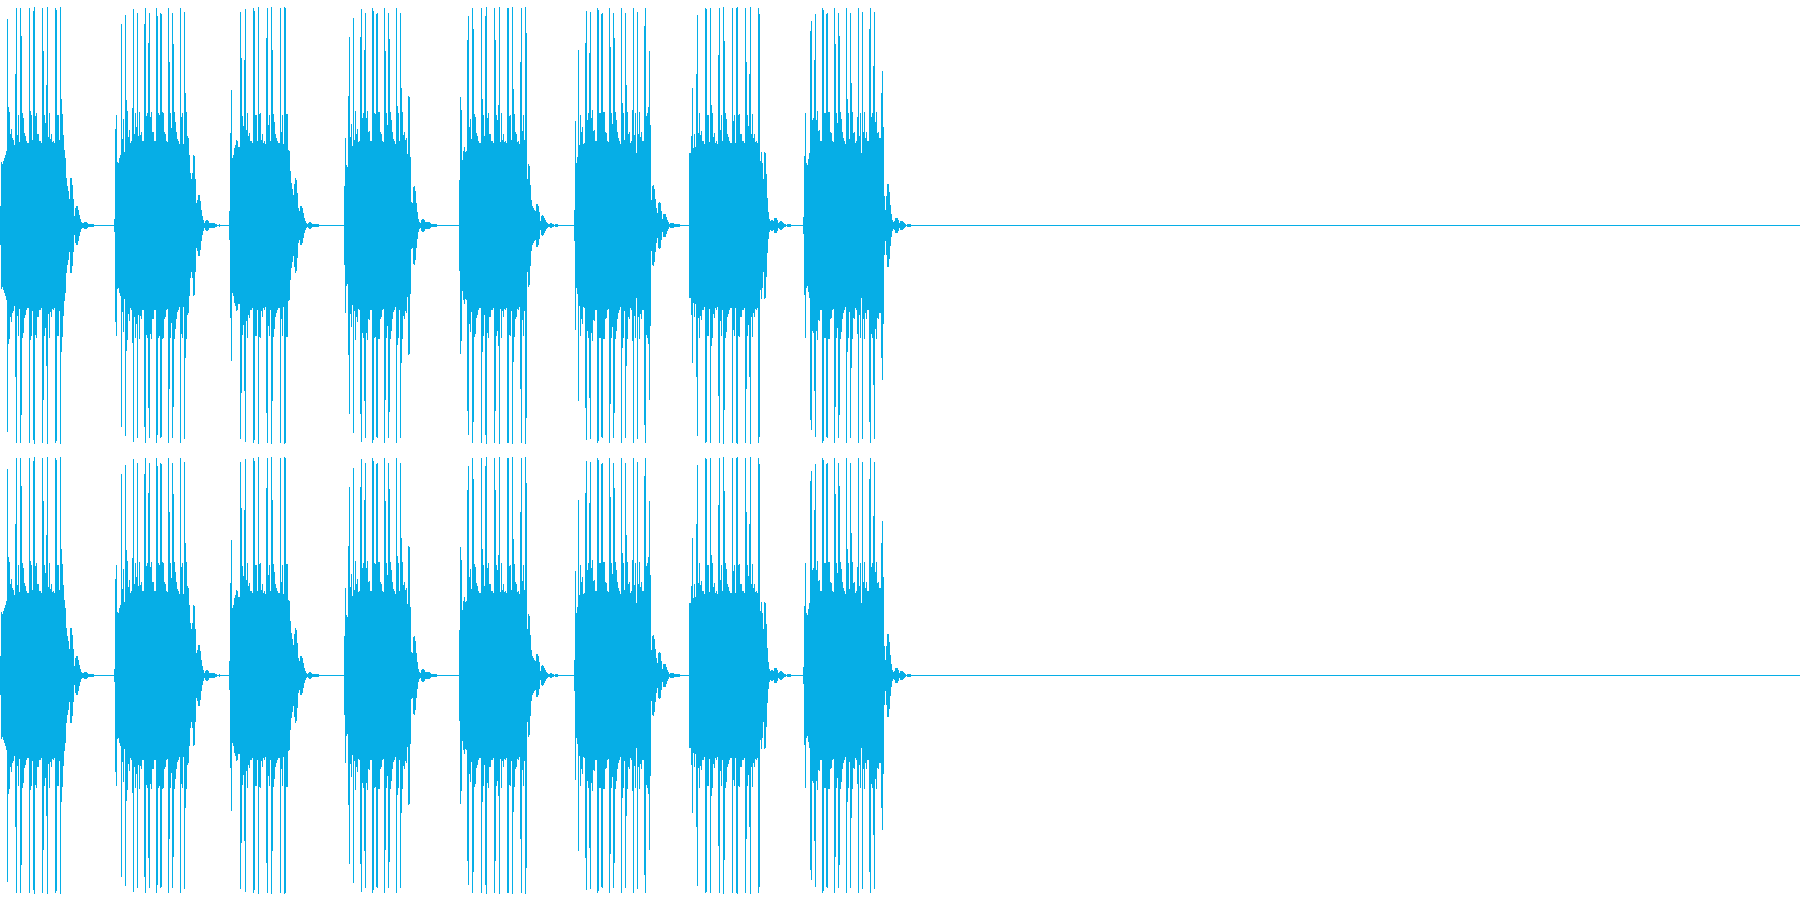 NG、キャンセル等の再生済みの波形